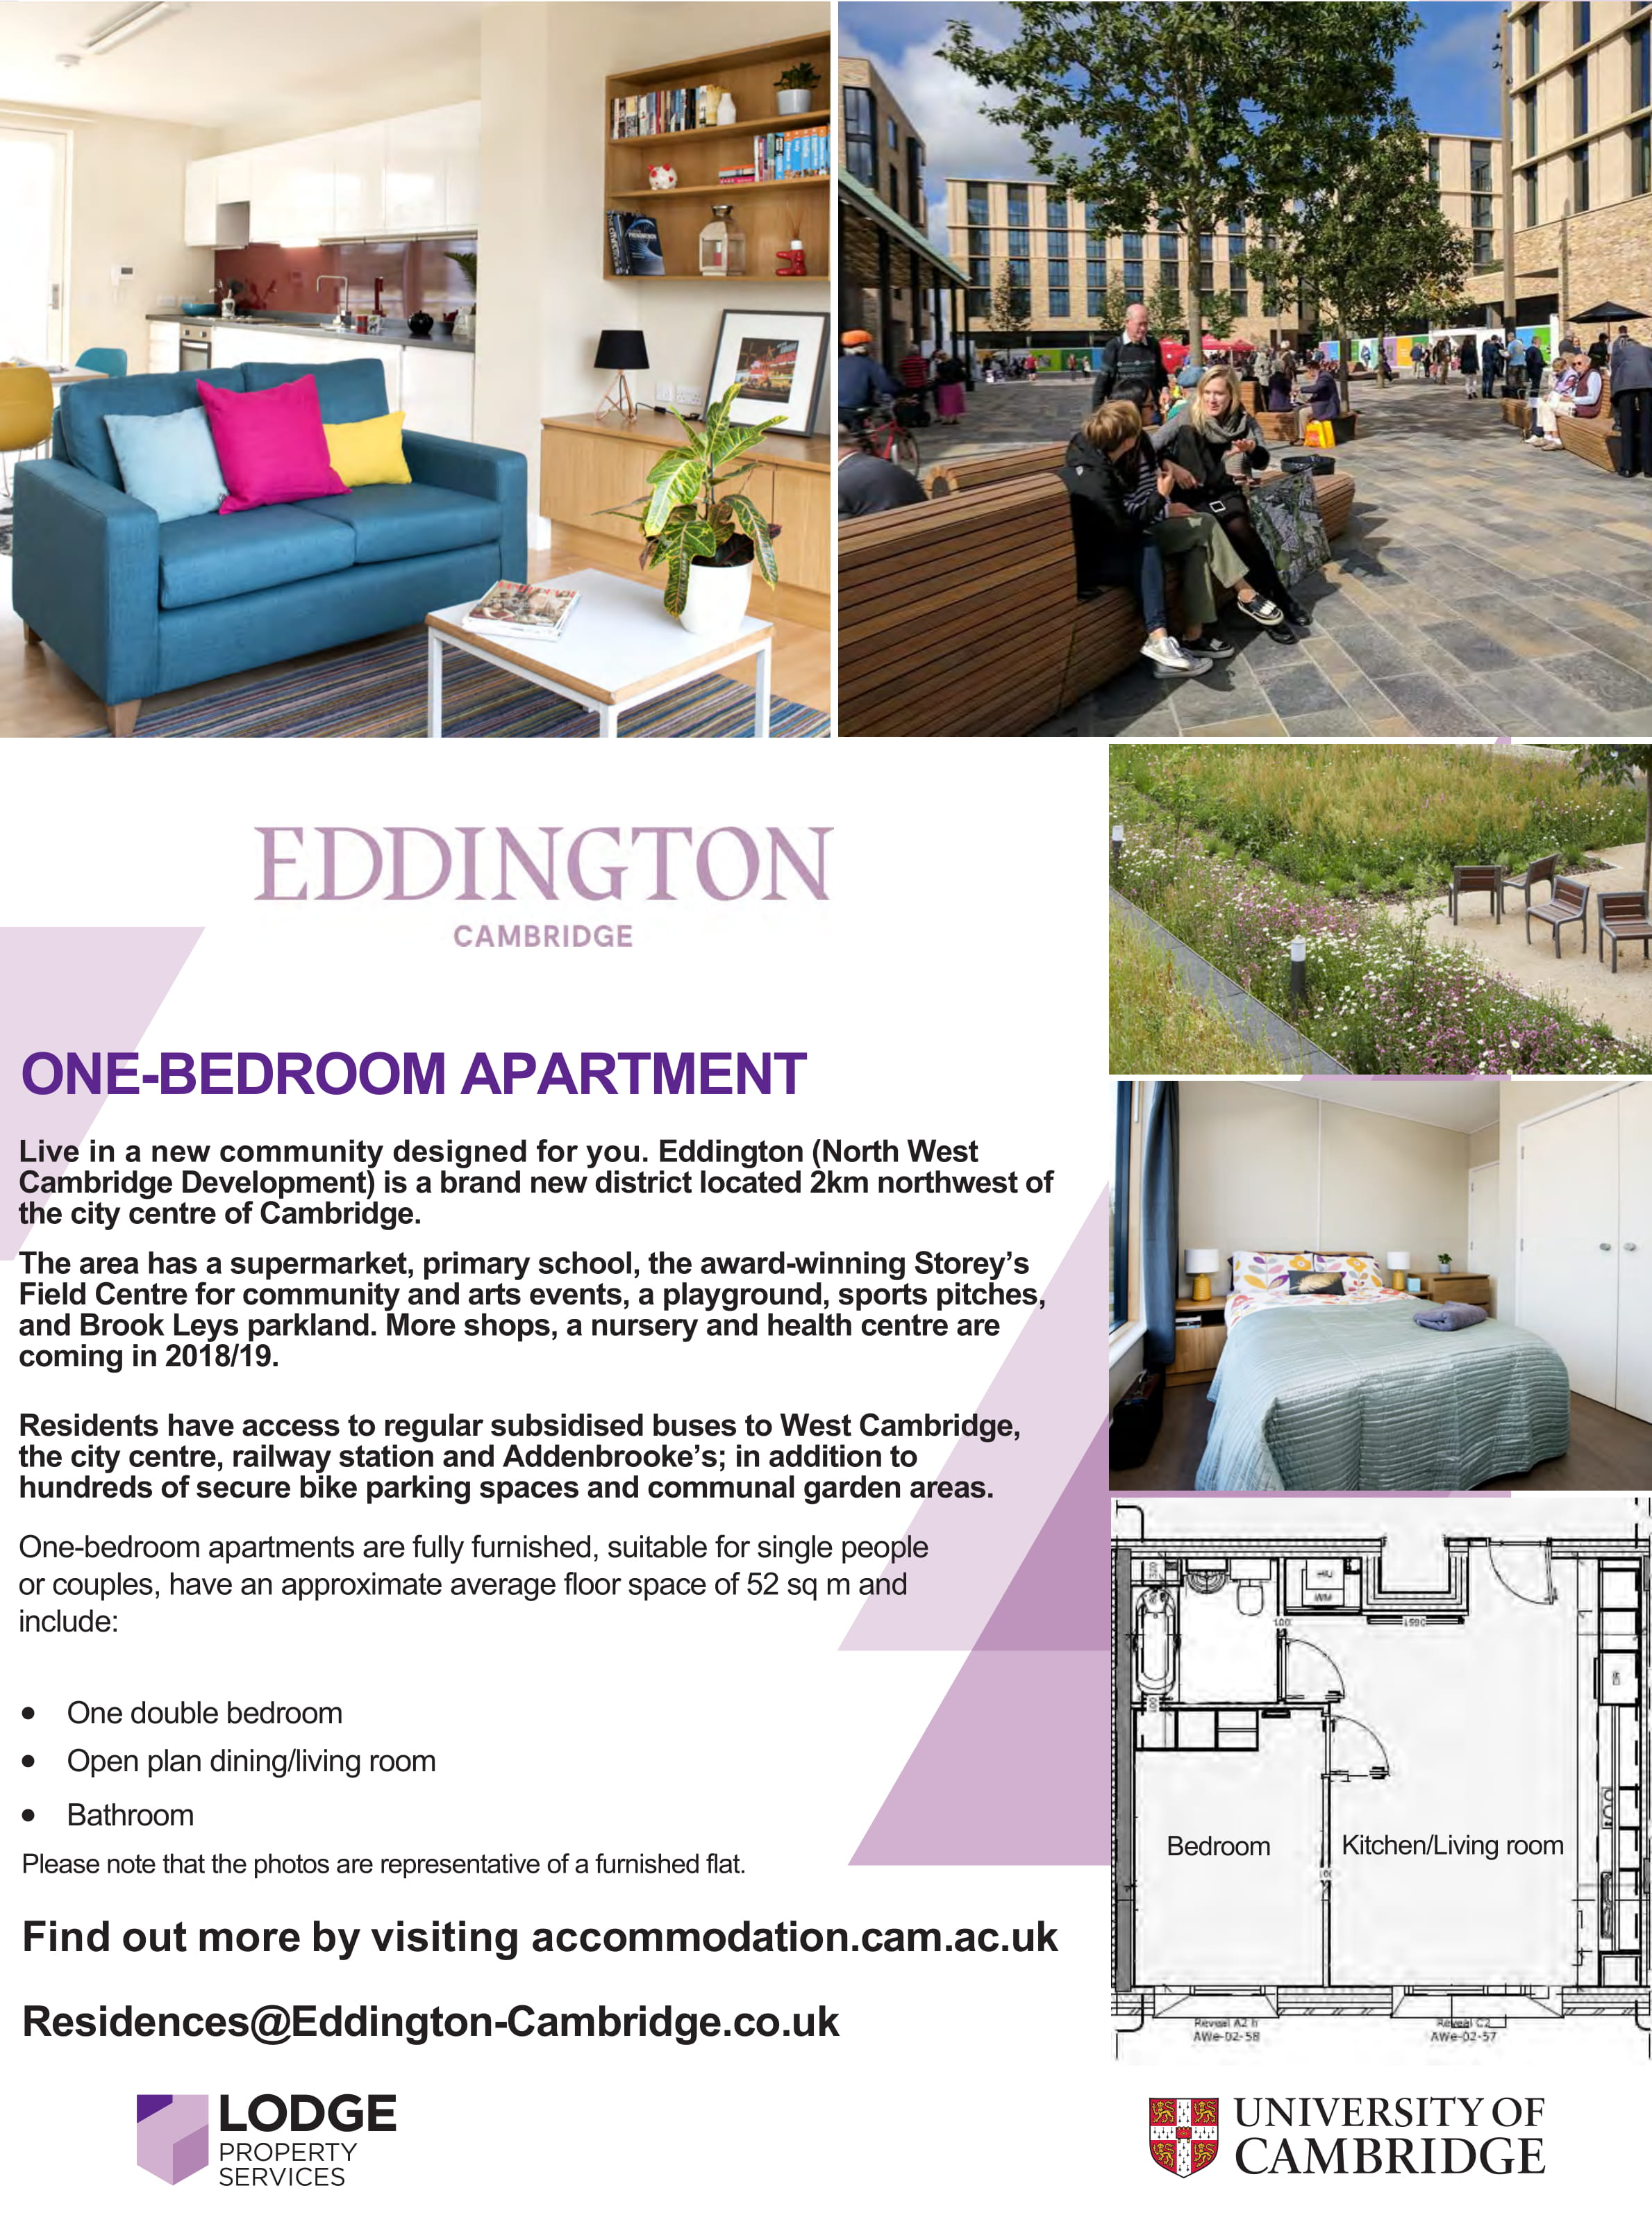 Outstanding Eddington One Bedroom Apartments Eddington North West Interior Design Ideas Gentotthenellocom